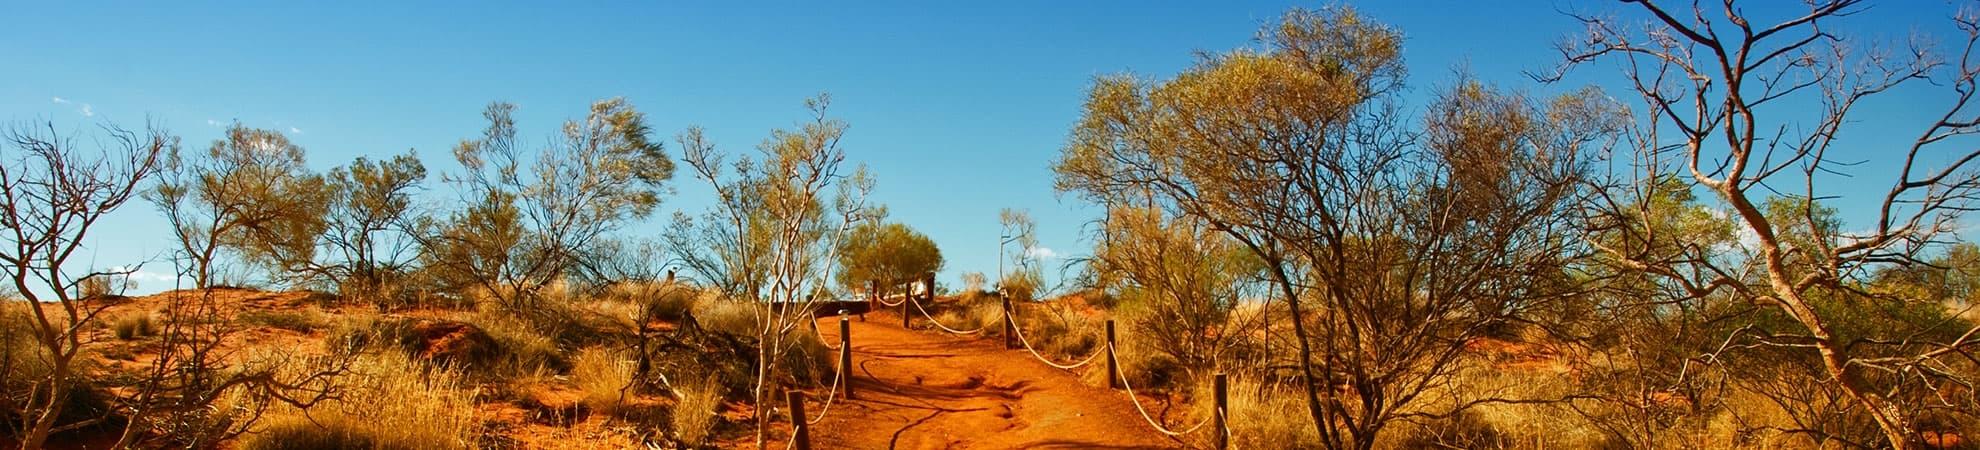 Voyage L'outback Australien